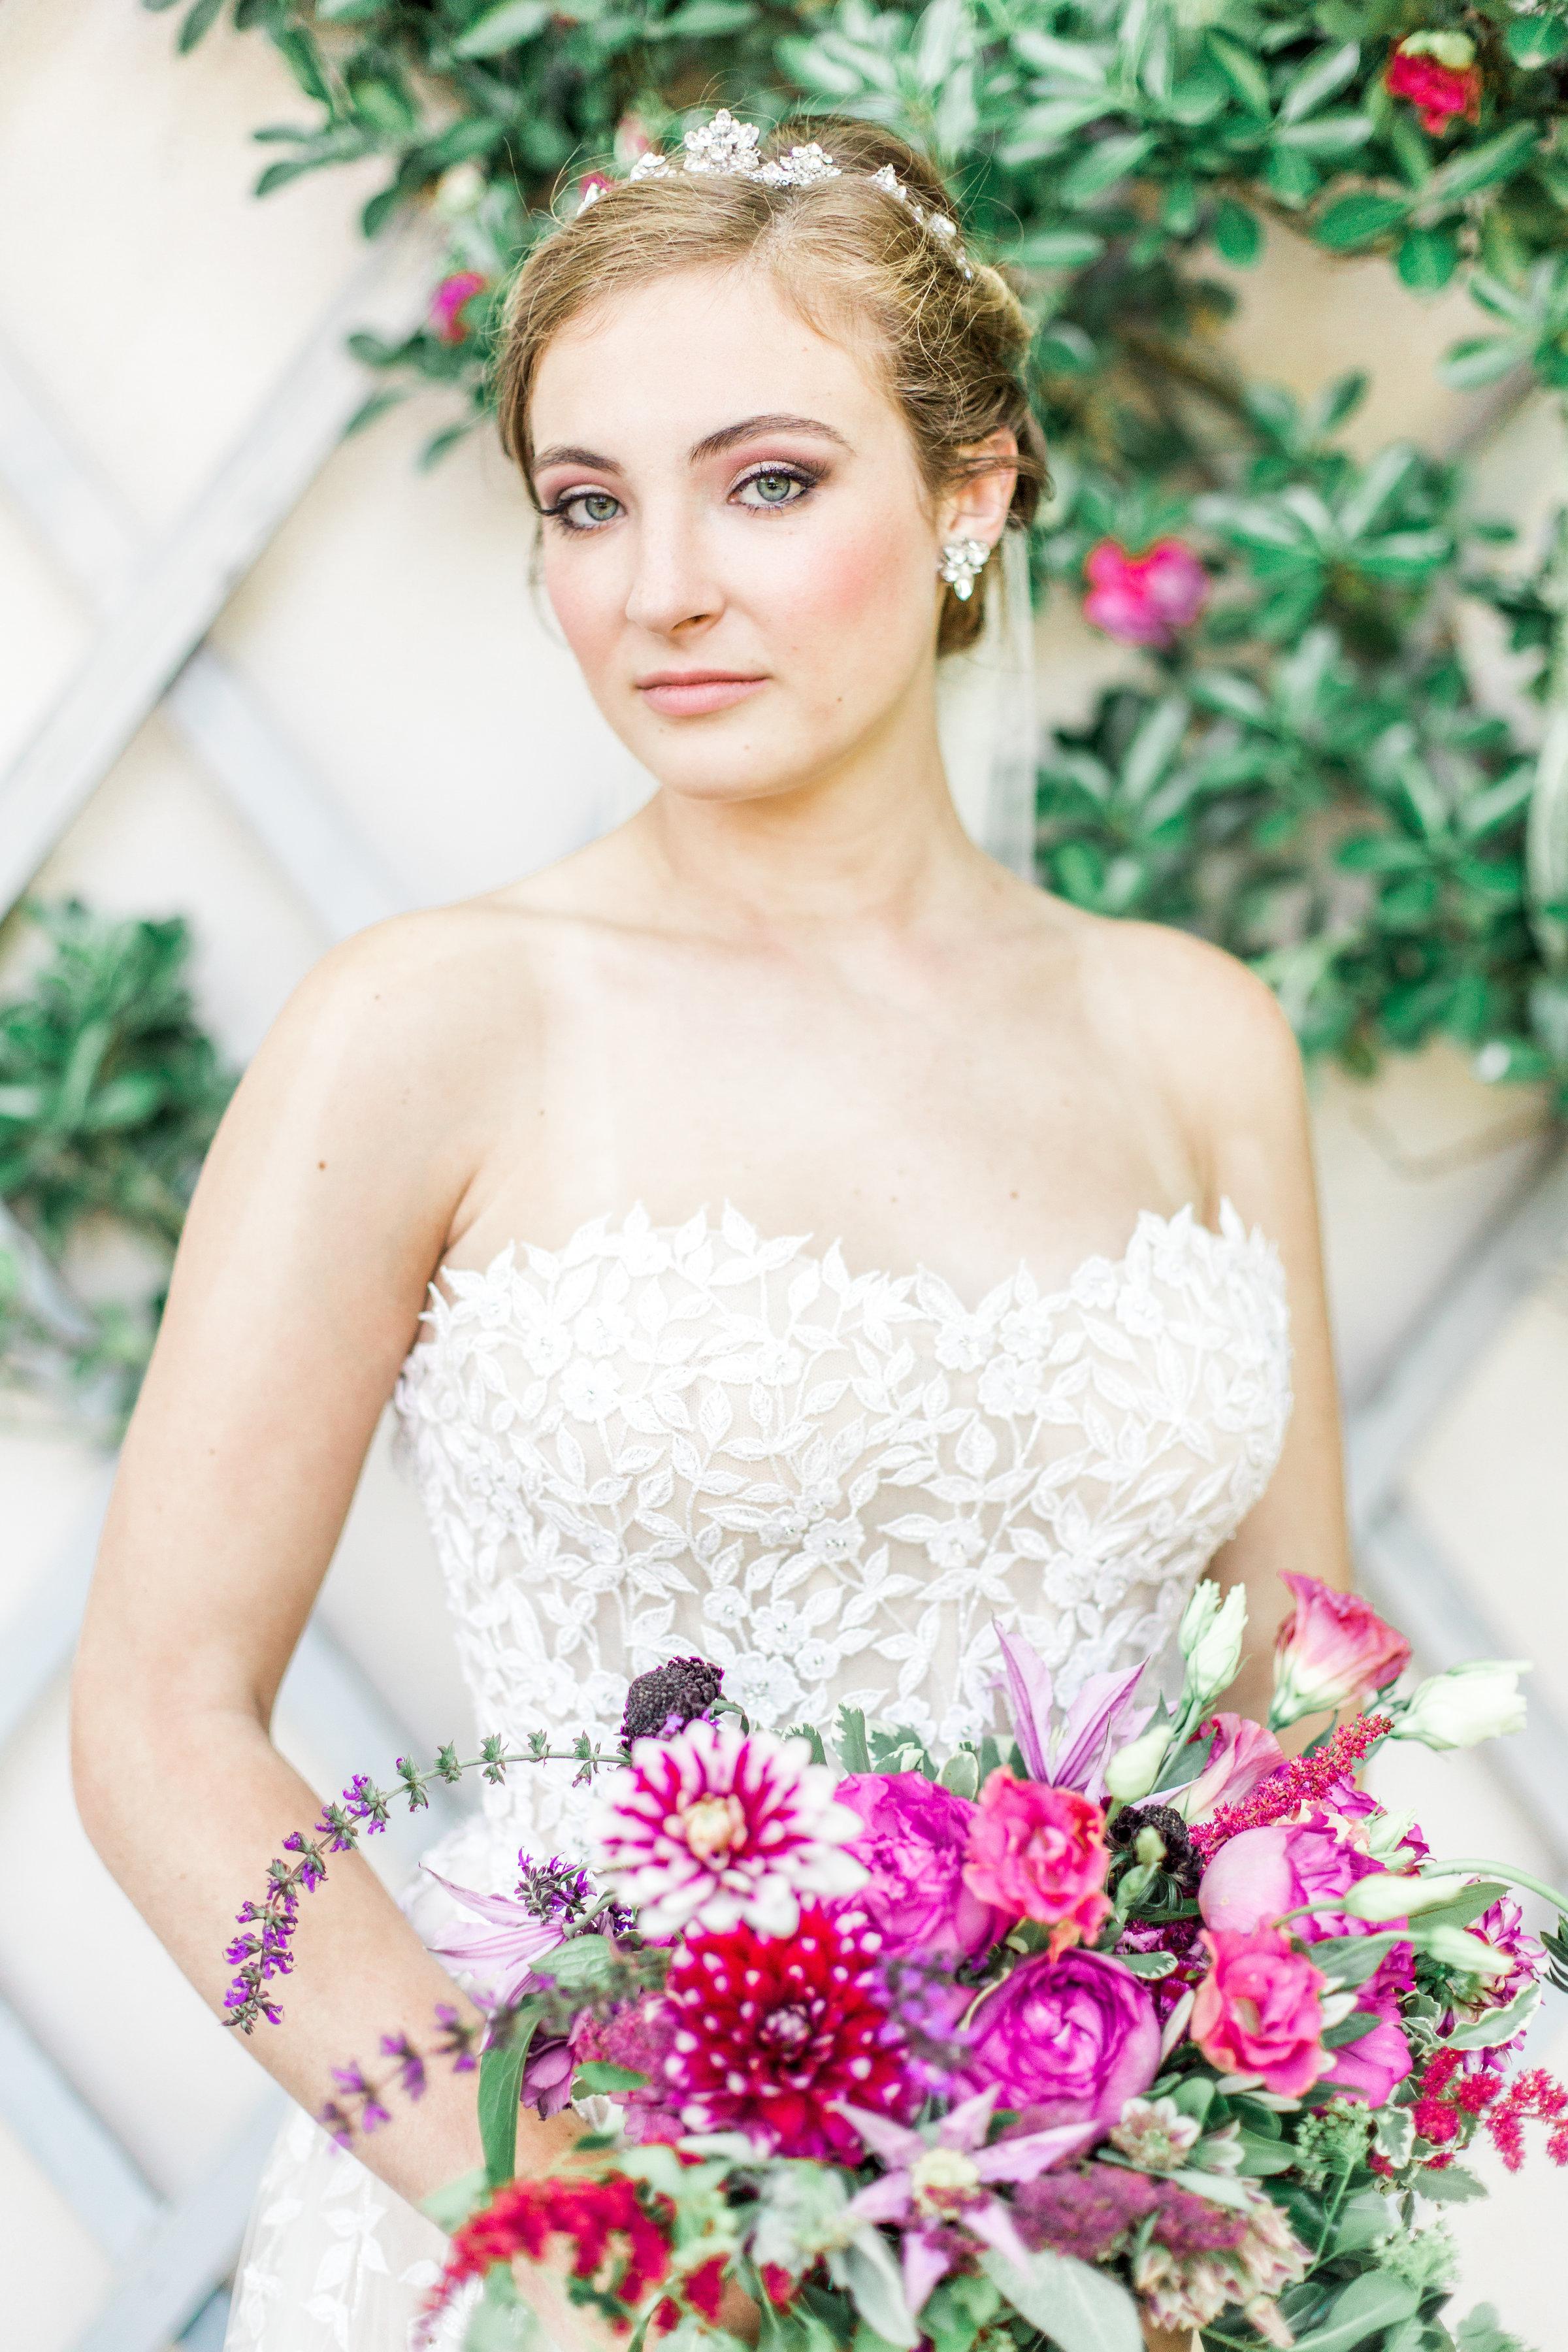 KristinaStaalPhotography-MaggieandJack2018-34.jpg